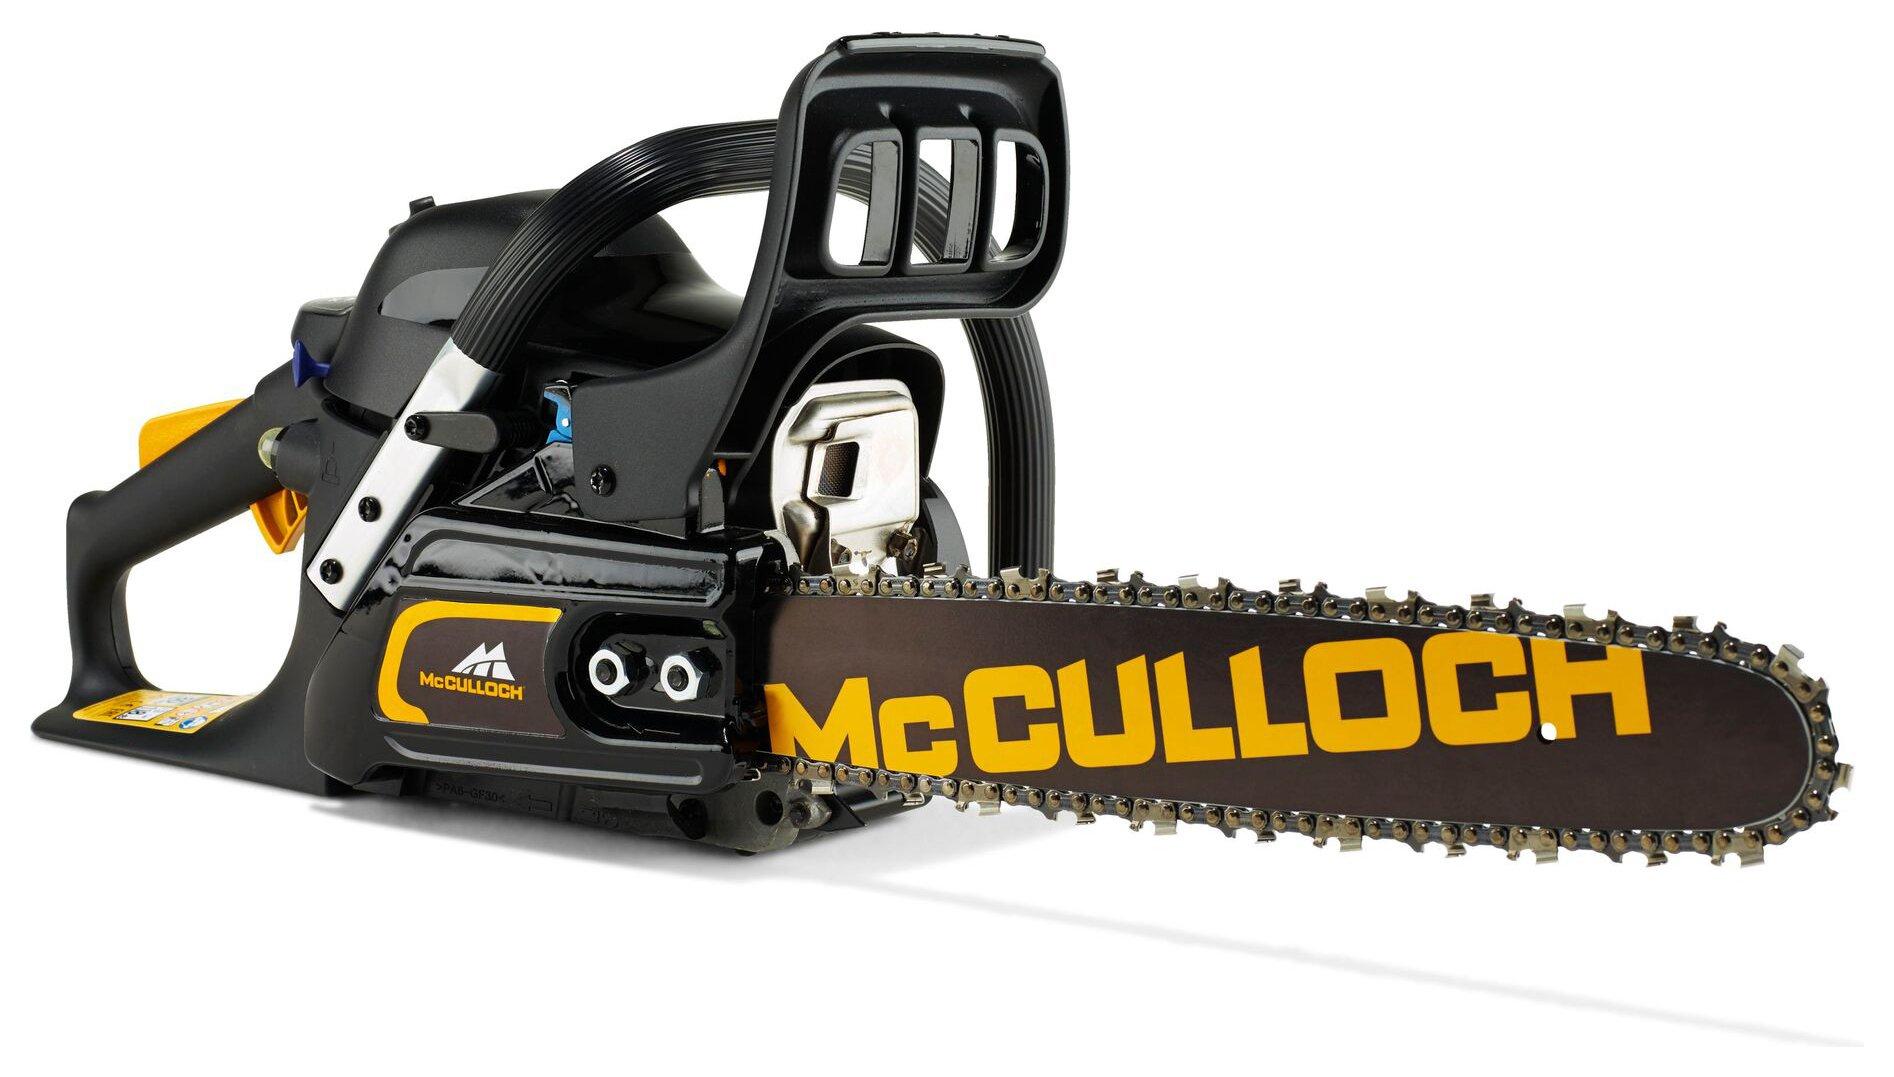 McCulloch CS35S 35cm Petrol Chainsaw - 35cc for £69.99 @ Argos